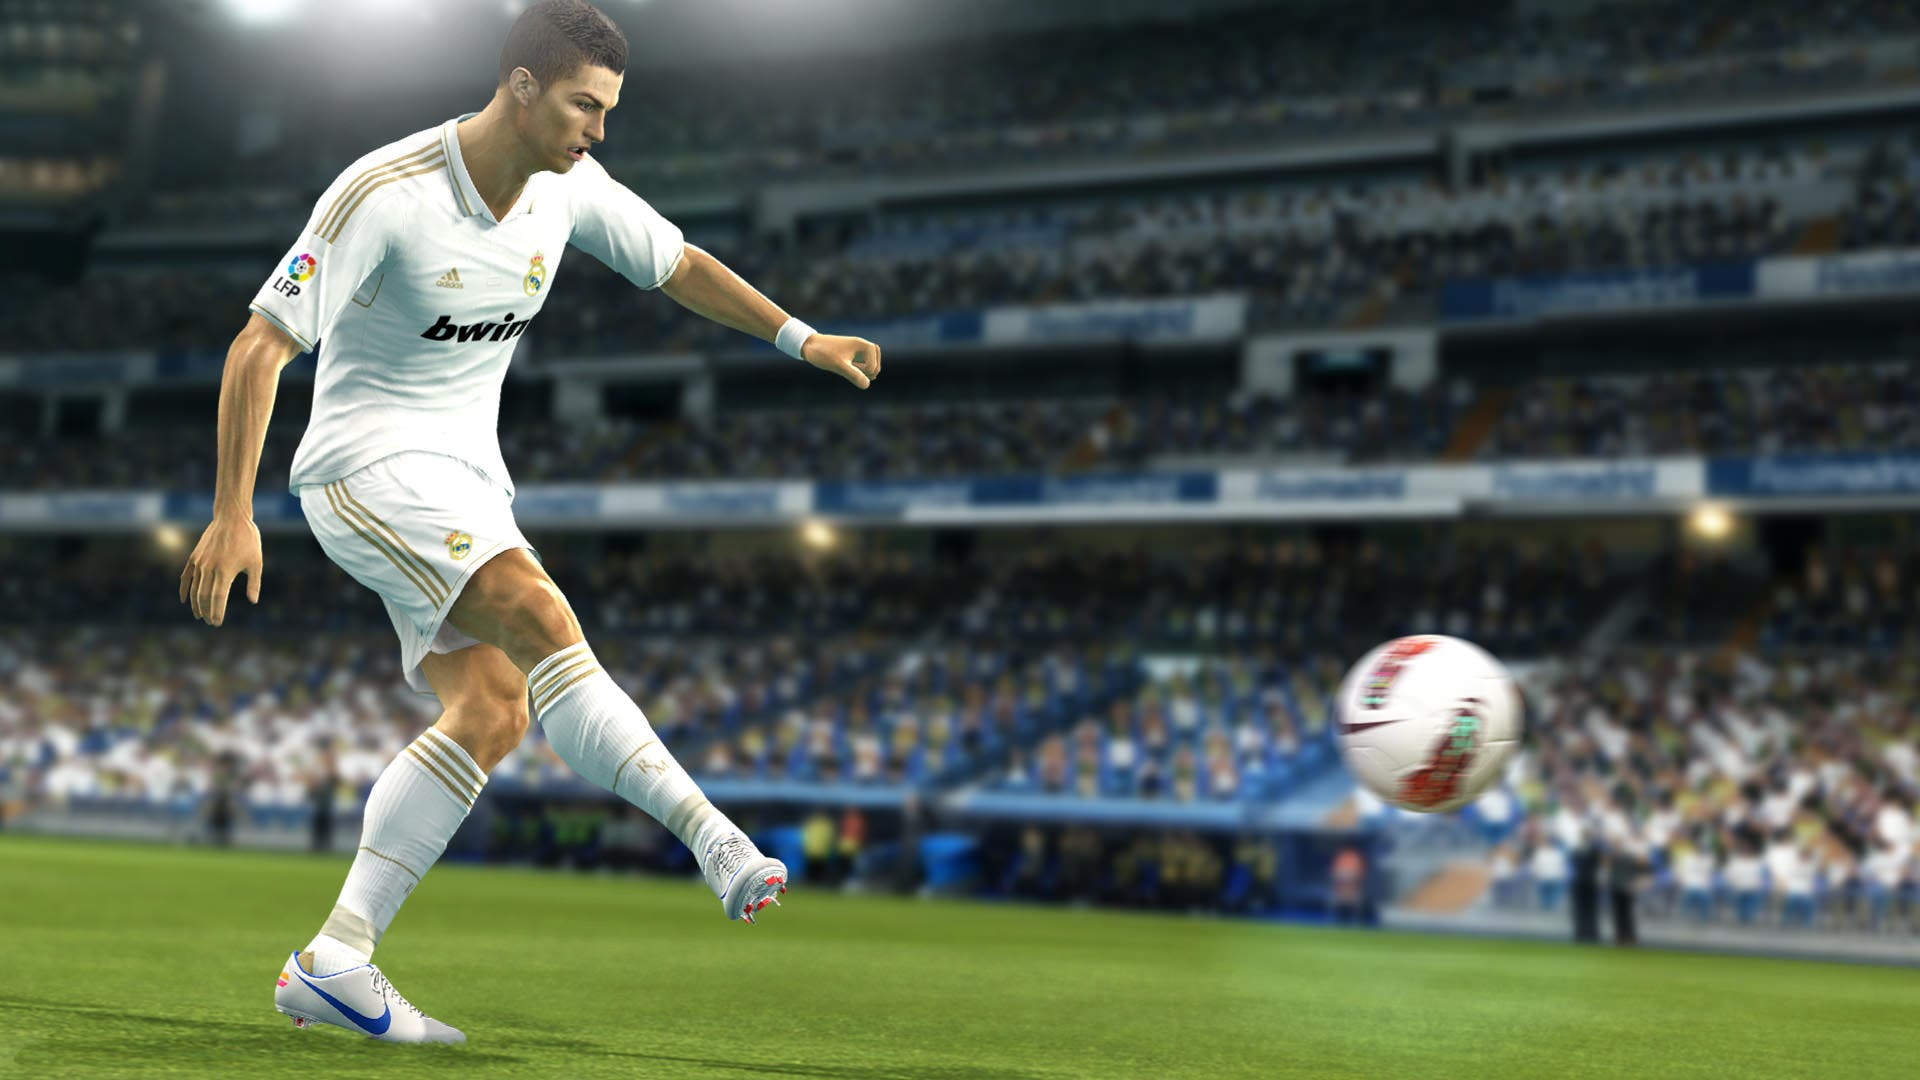 Pro Evolution Soccer 2013 no se lanzarán de momento para Wii U ni PS Vita